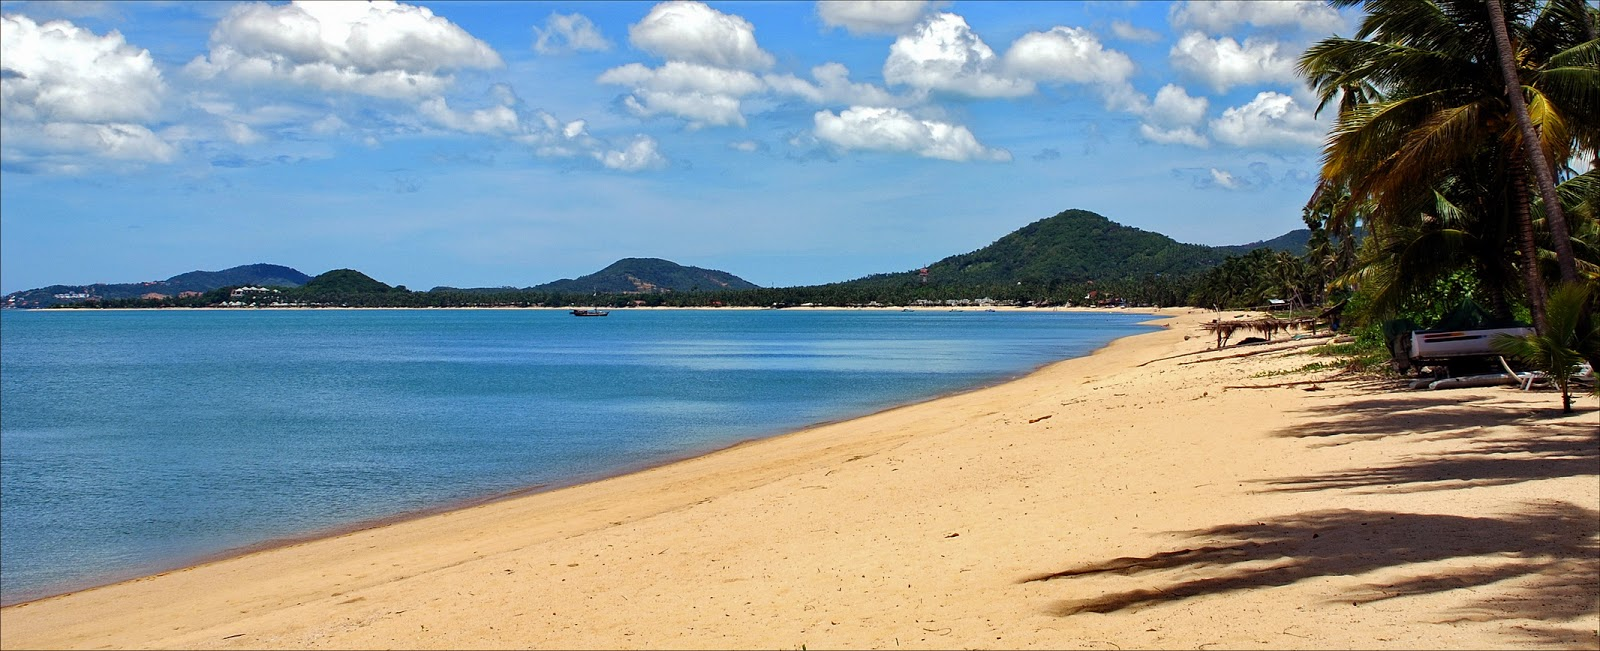 Mae-Nam-beach-koh-samui-thailand-best-beach-world